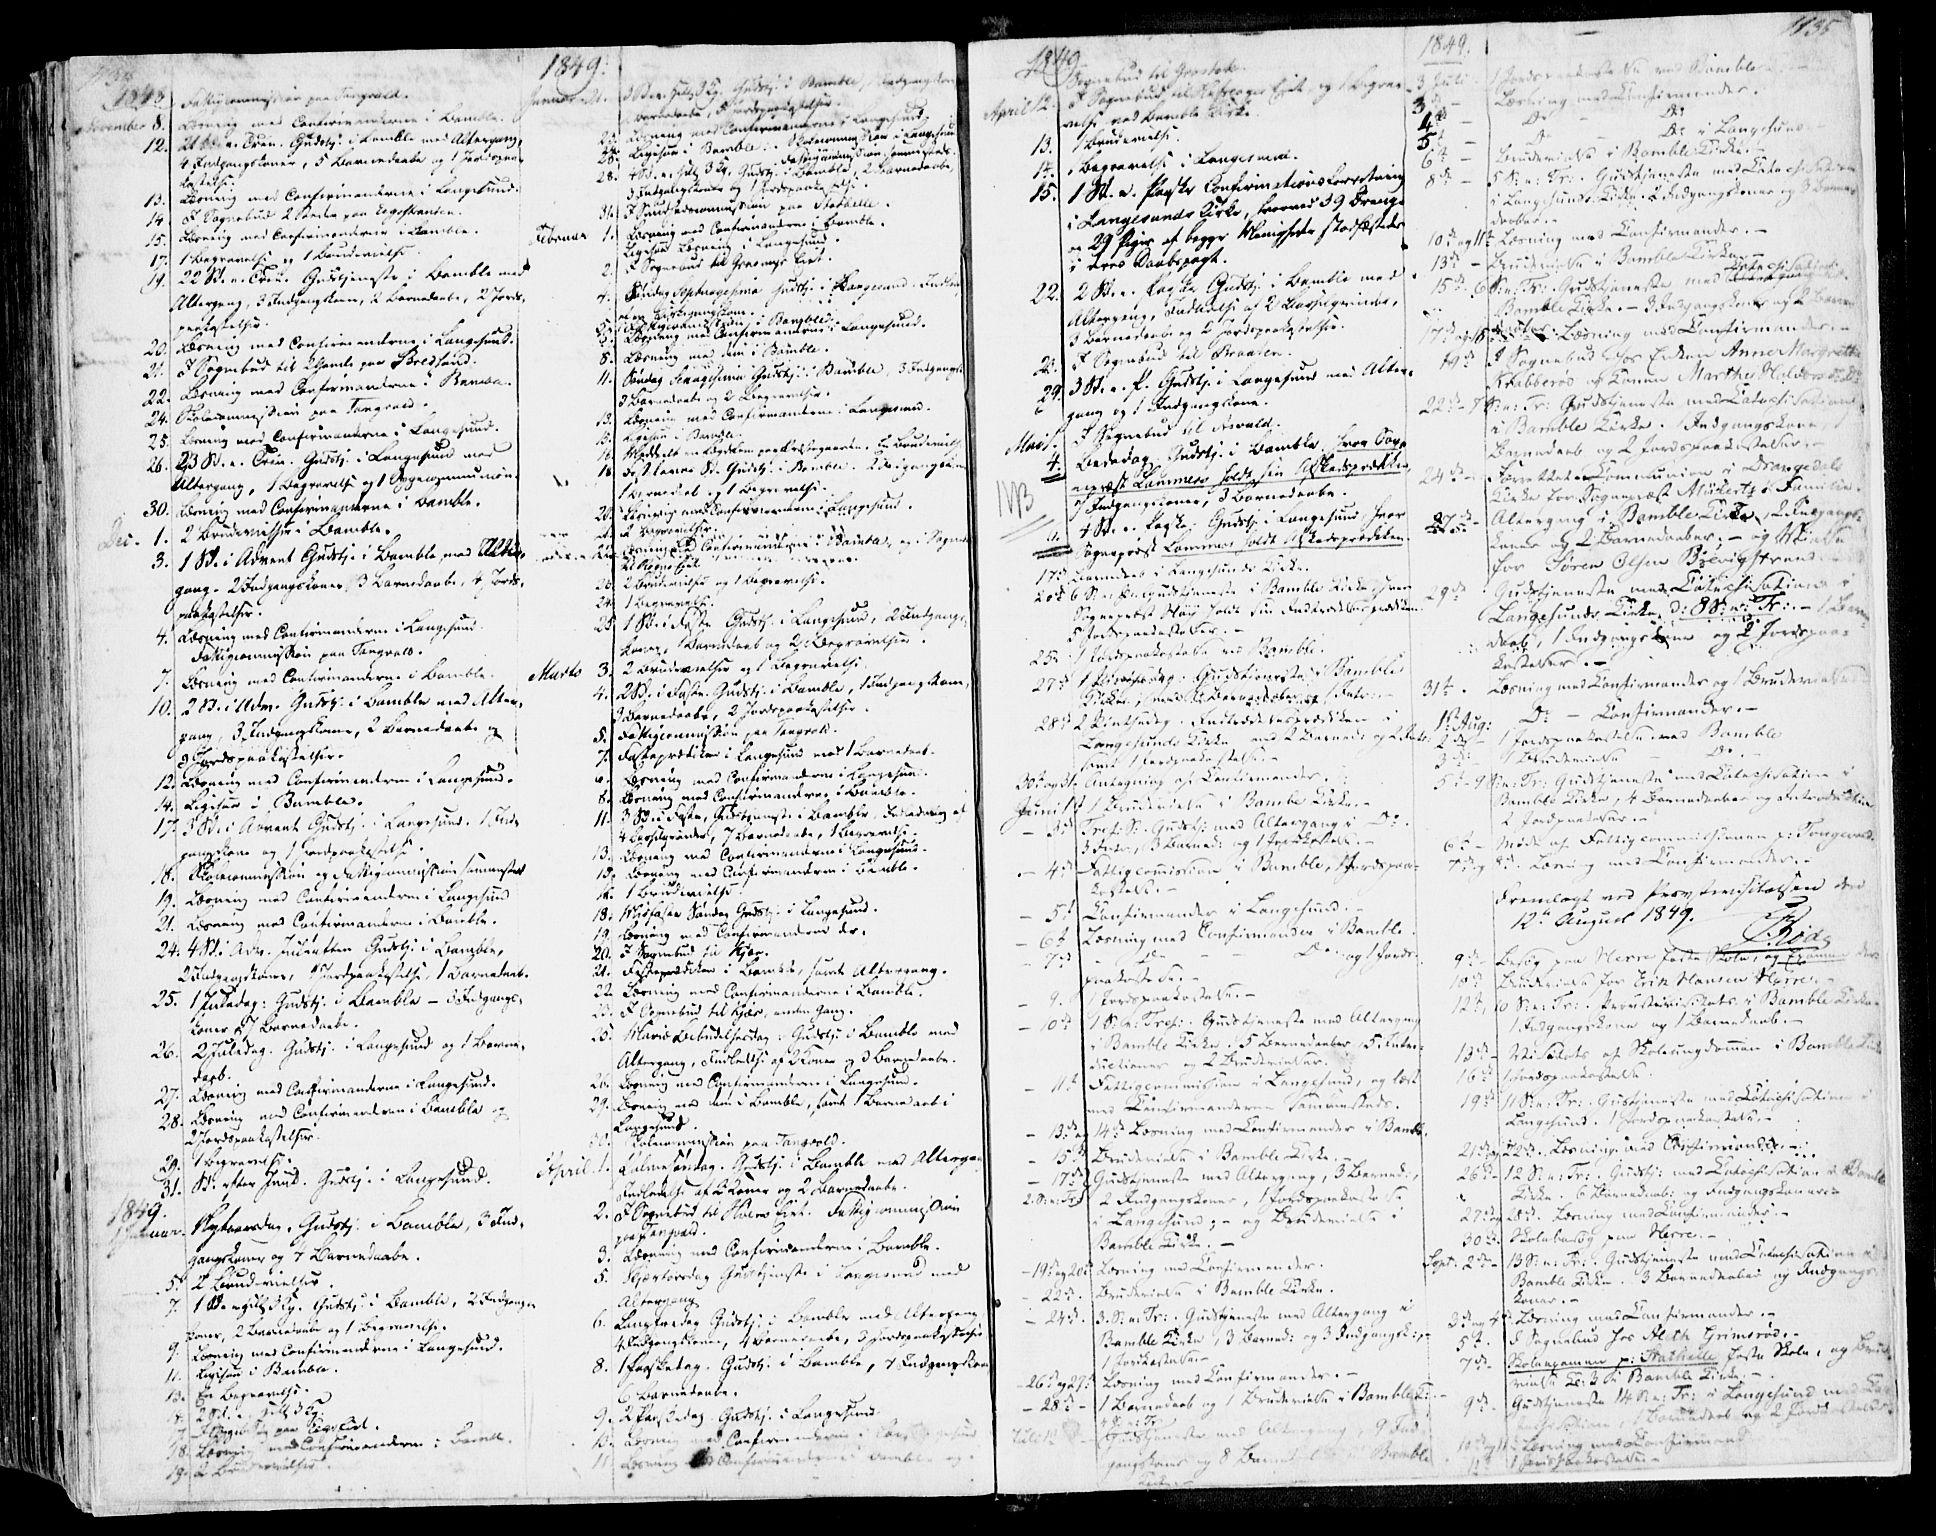 SAKO, Bamble kirkebøker, F/Fa/L0004: Ministerialbok nr. I 4, 1834-1853, s. 1134-1135